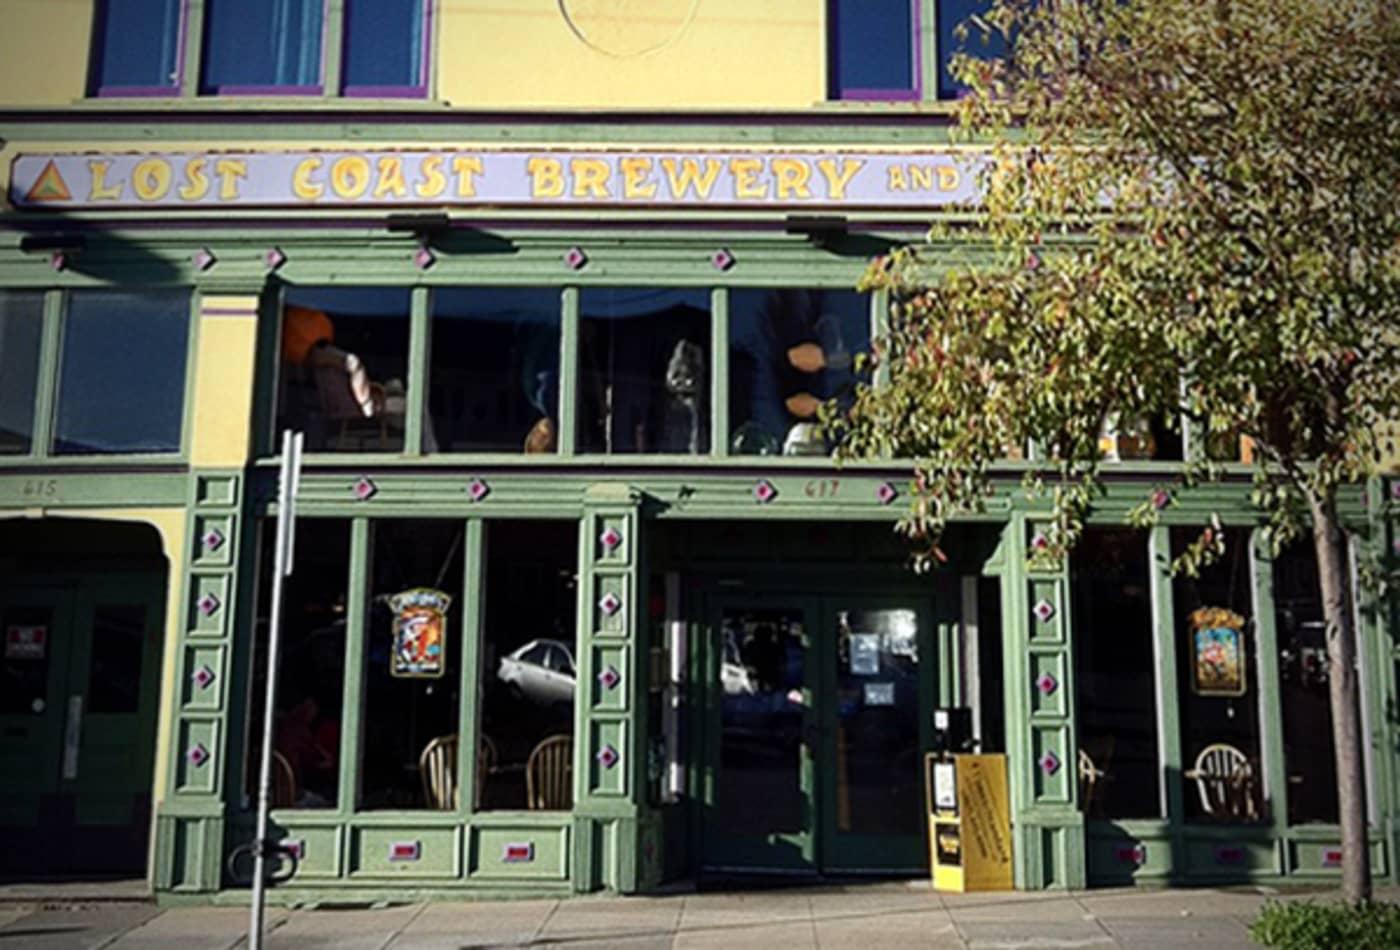 lost-coast-brewery.jpg